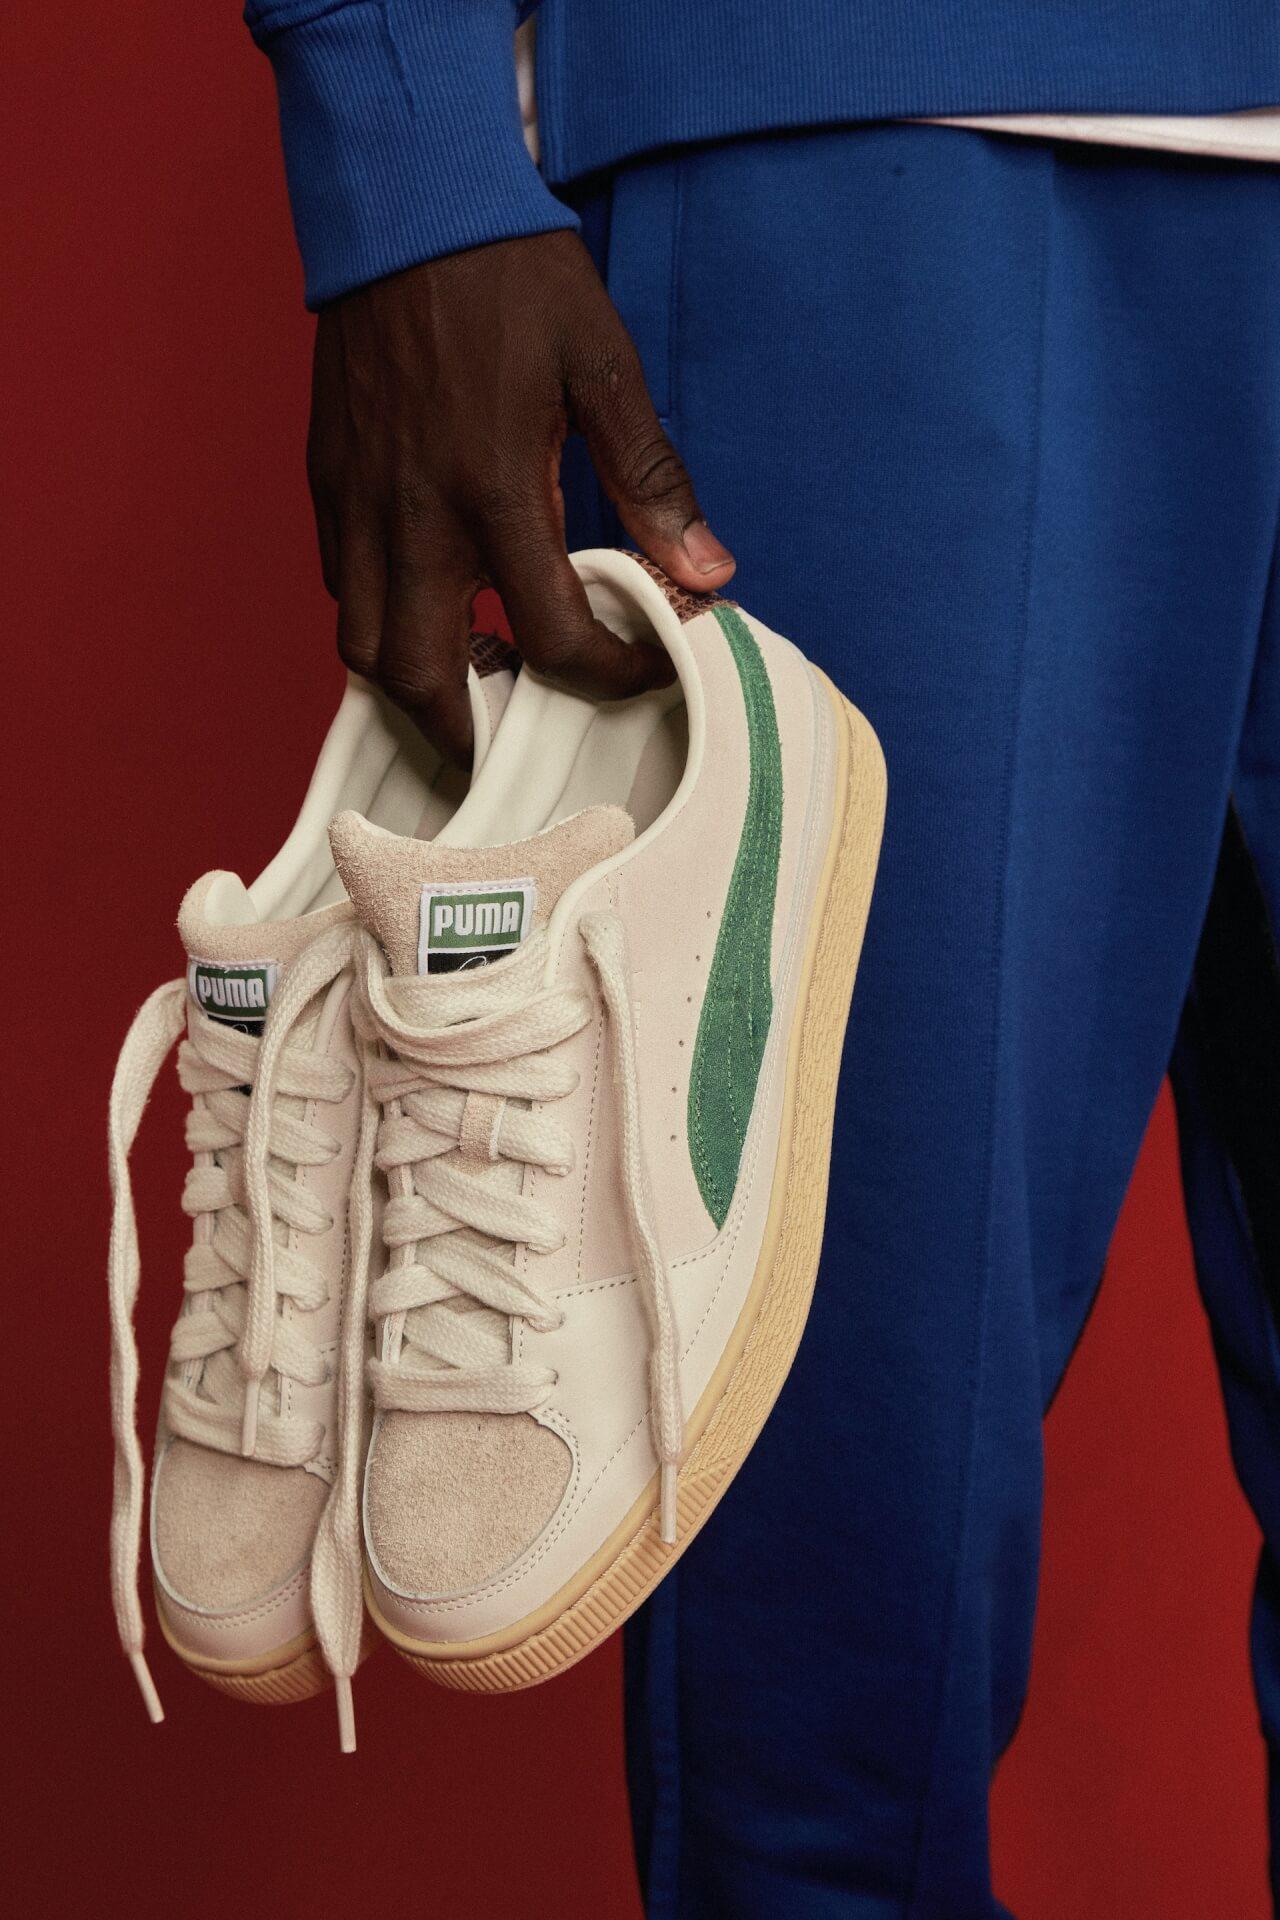 LA発ストリートブランドRHUDEとPUMAによるコラボレーションアイテムが新登場!「PUMA SUEDE」の新モデルも本日発売 Fashion10617_PUMA7